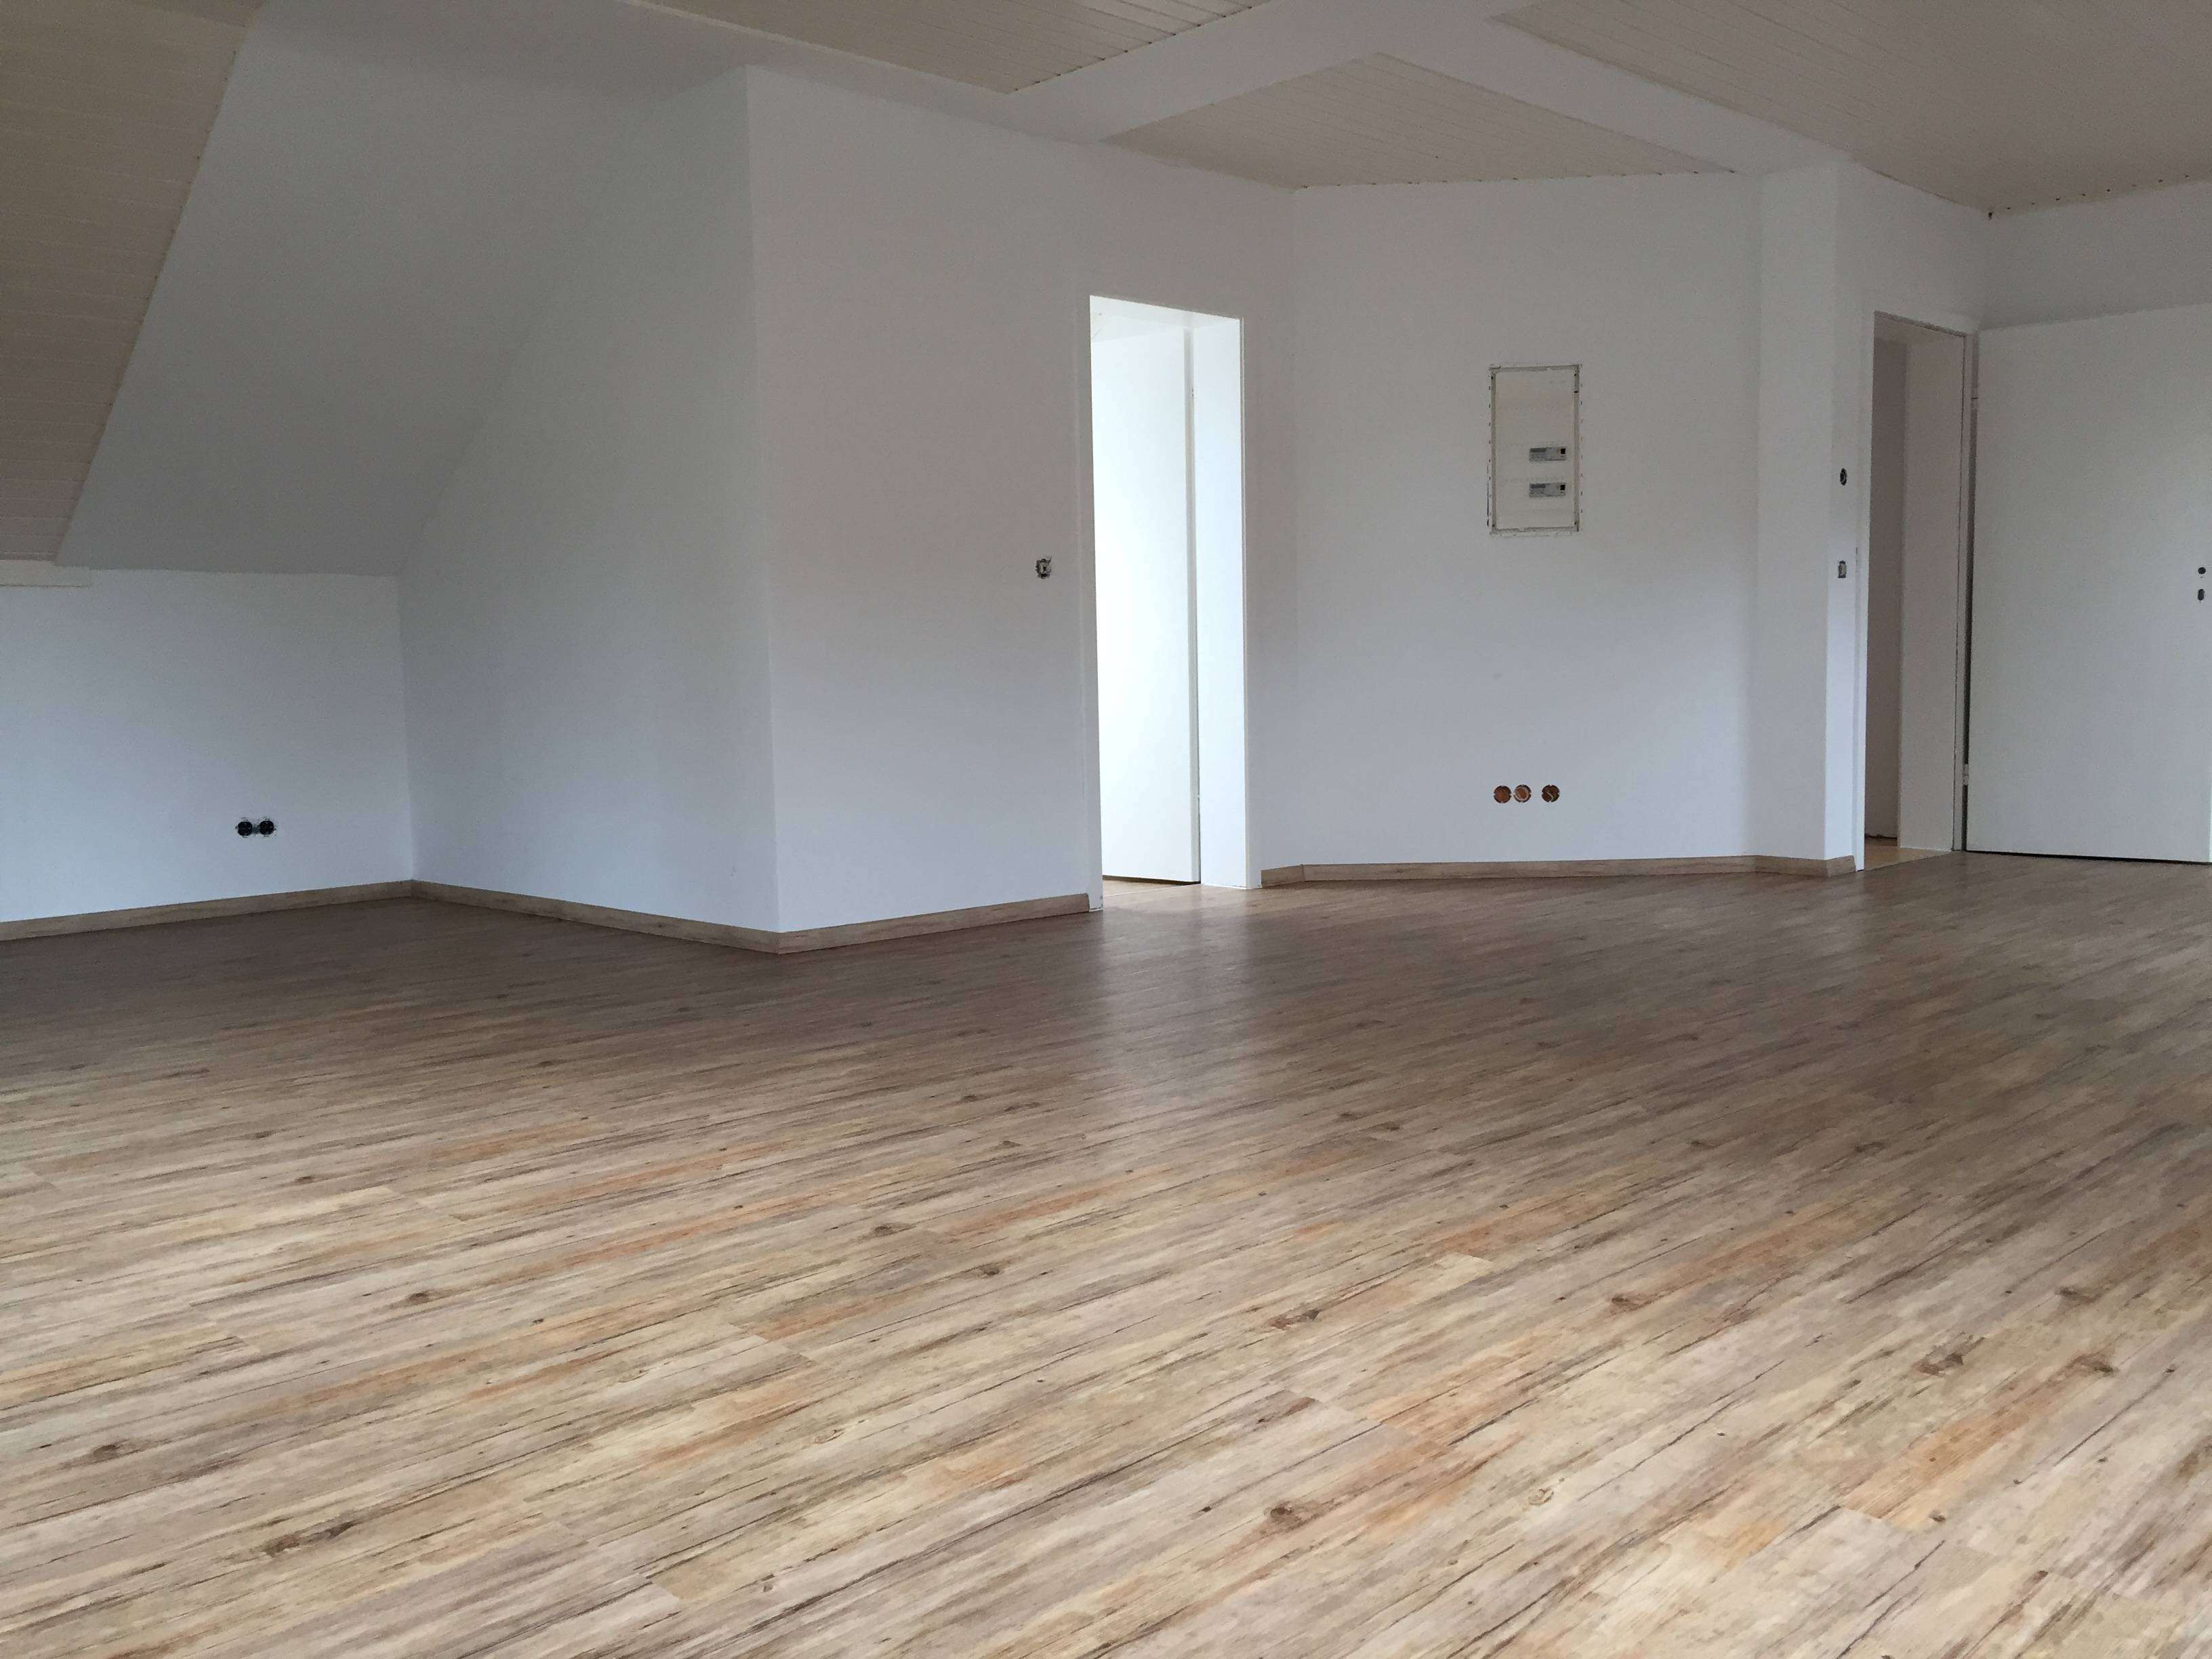 yoga studio fussboden mutsch. Black Bedroom Furniture Sets. Home Design Ideas